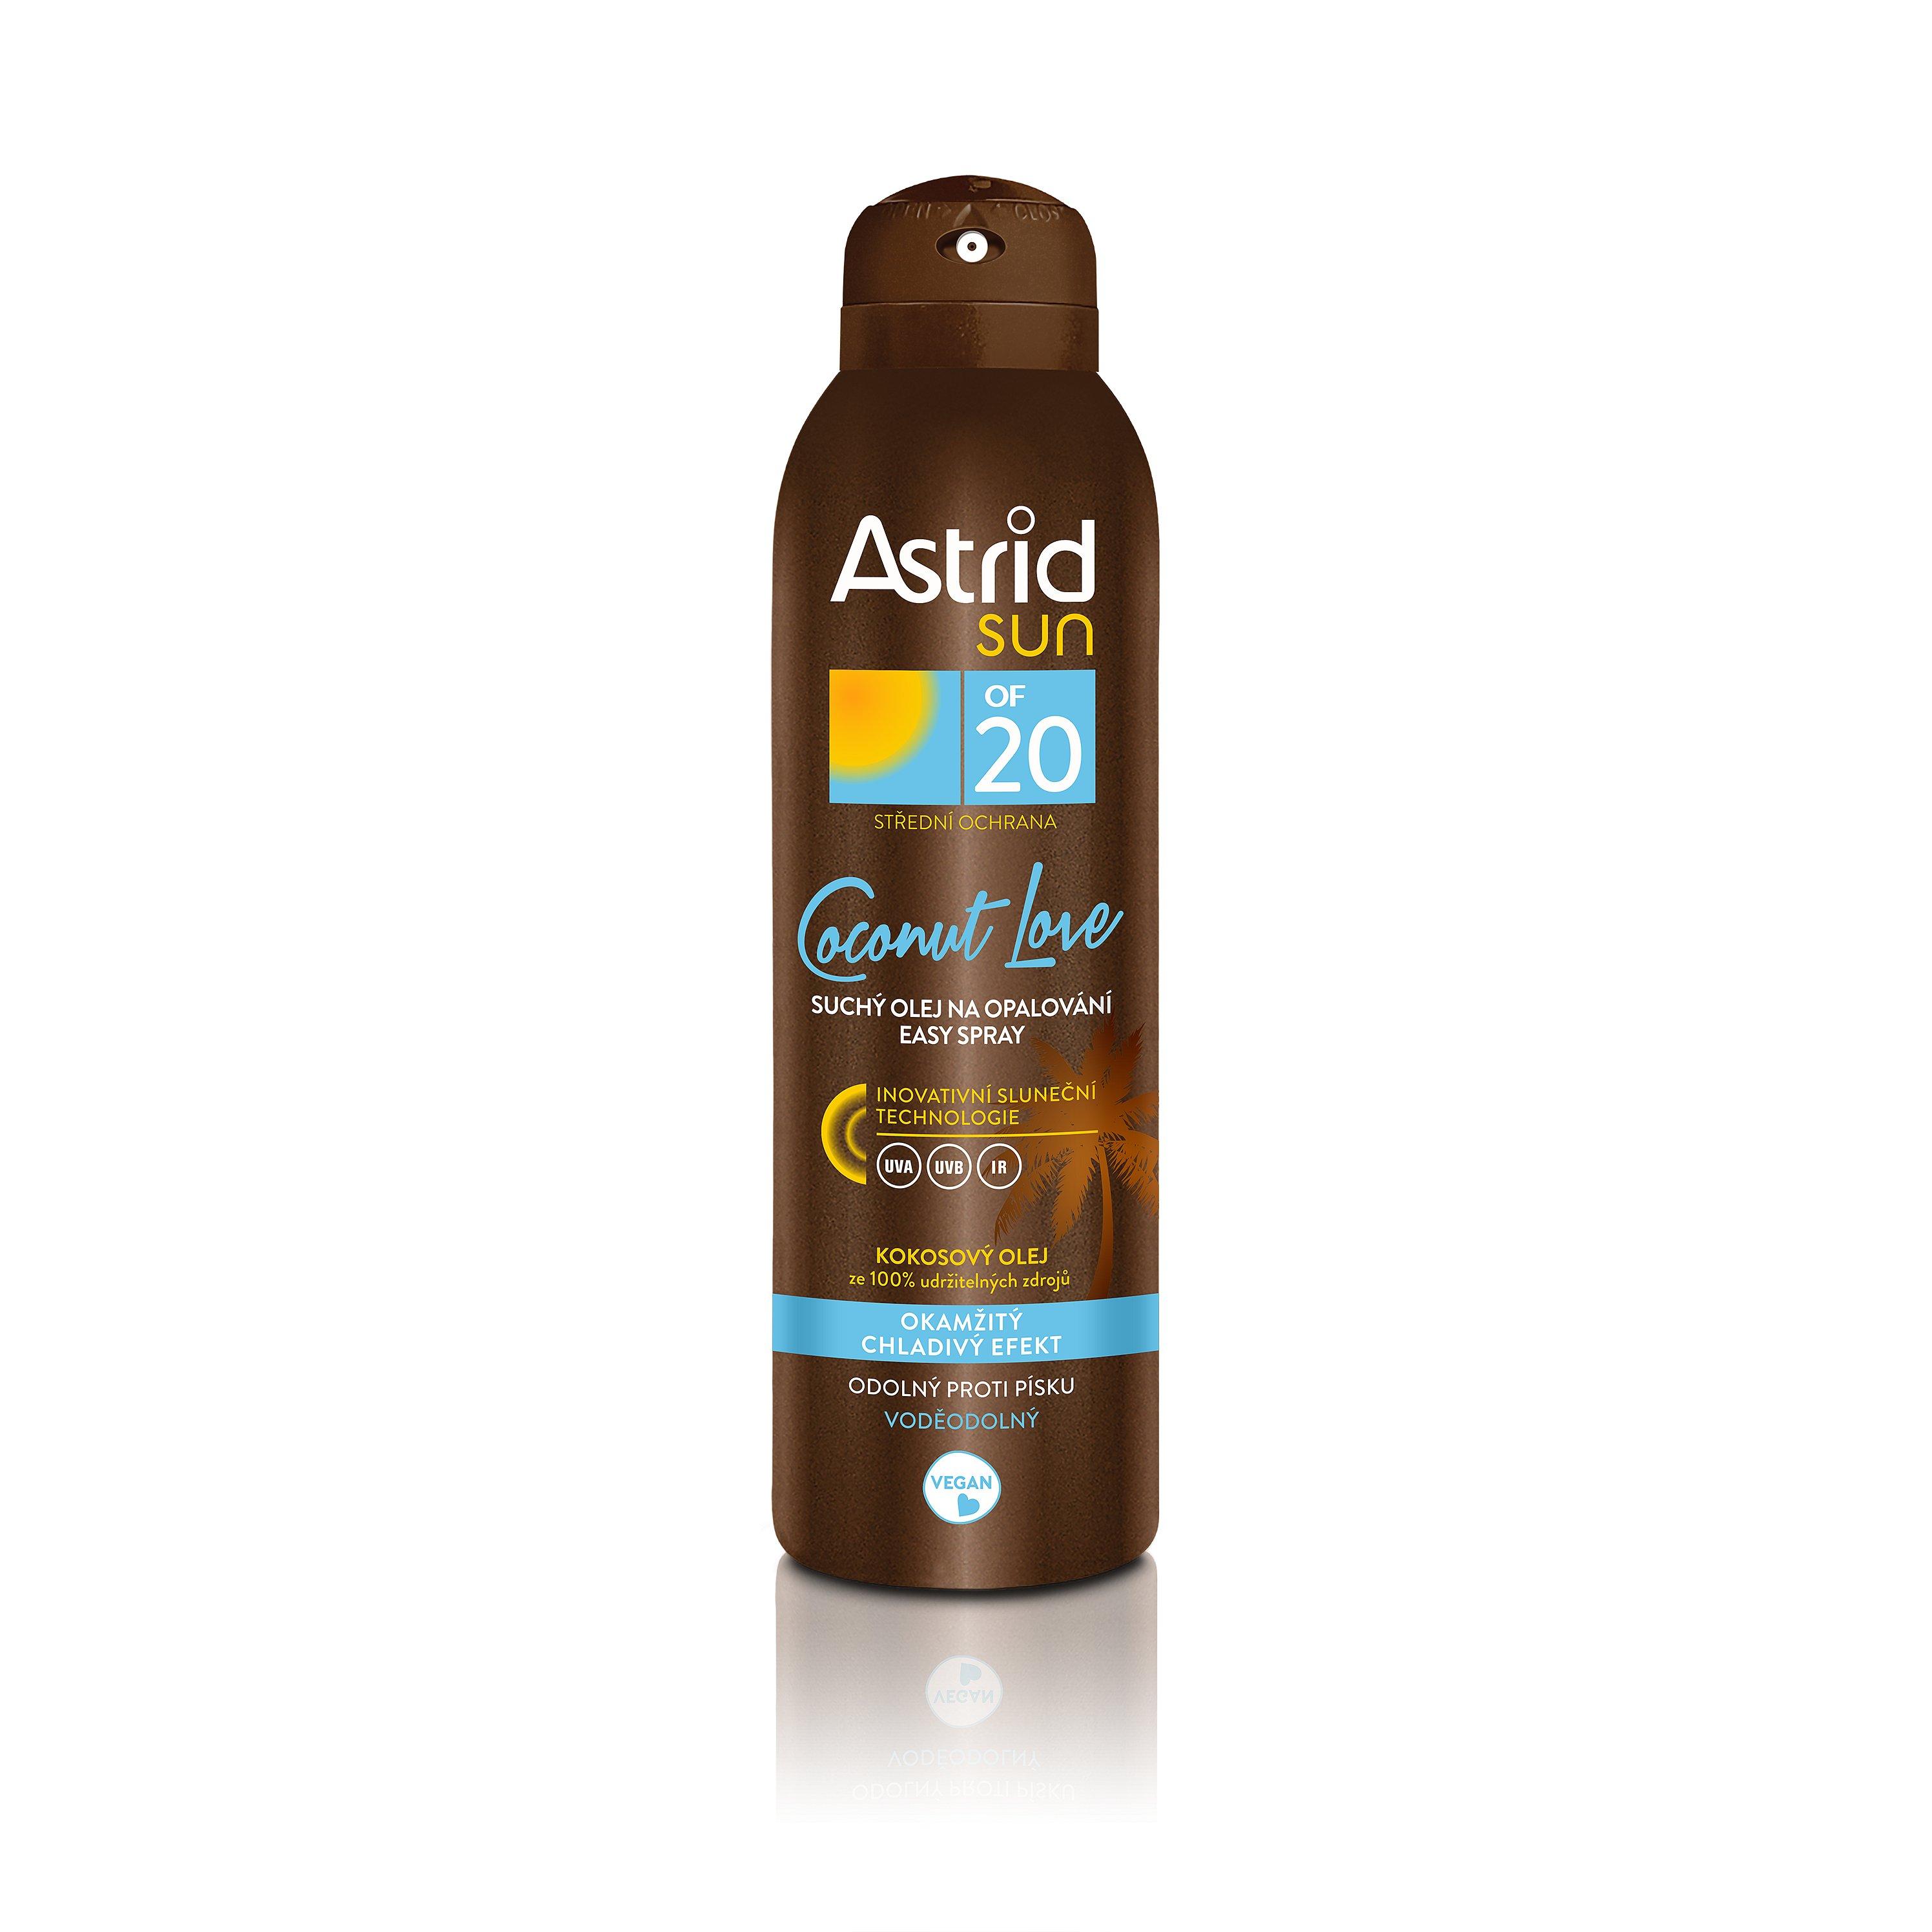 ASTRID SUN Suchý olej na opalování easy spray OF 20  150 ml